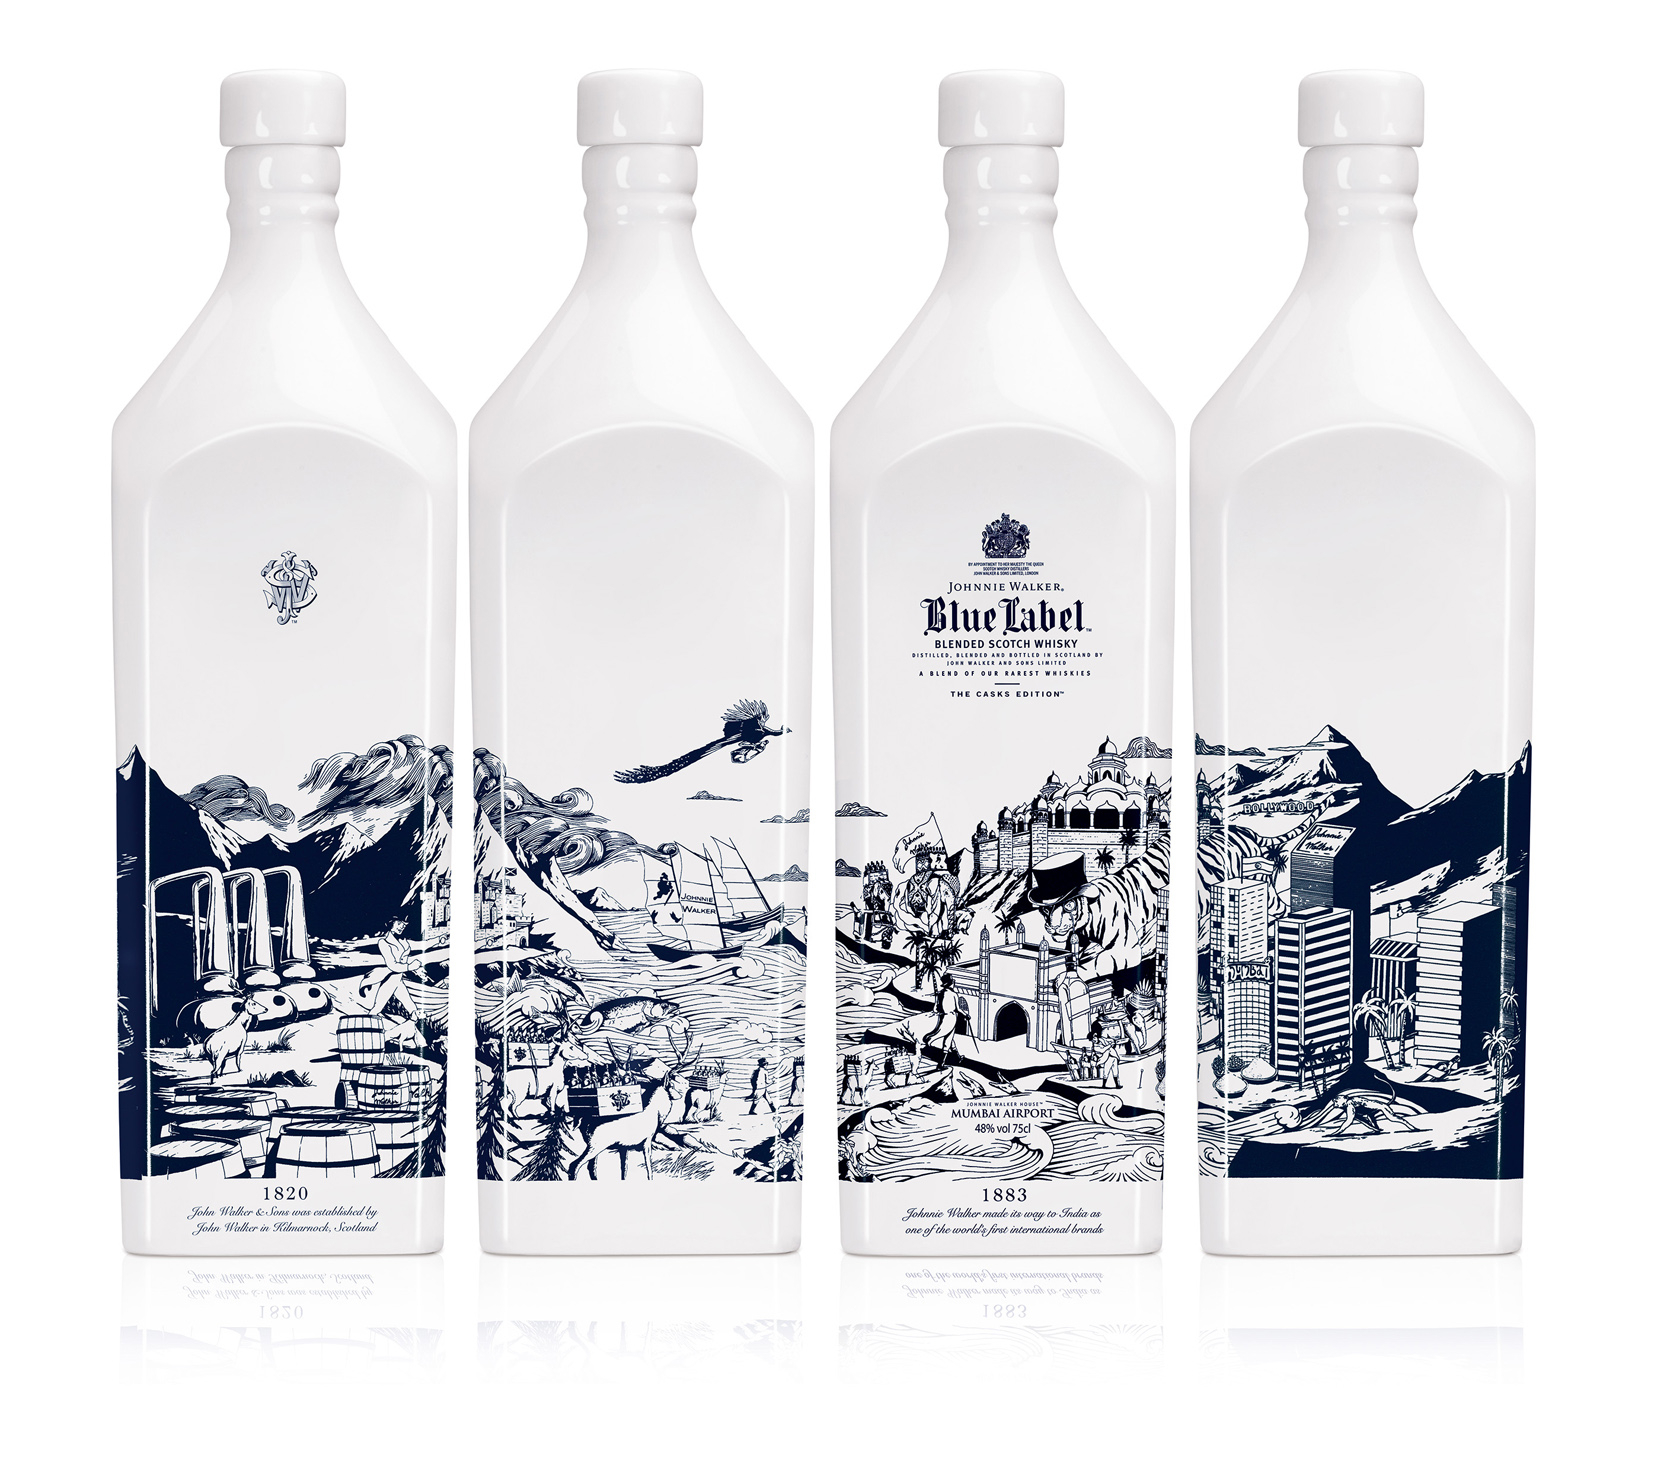 Johnnie Walker Blue Label / Mumbai Bottle